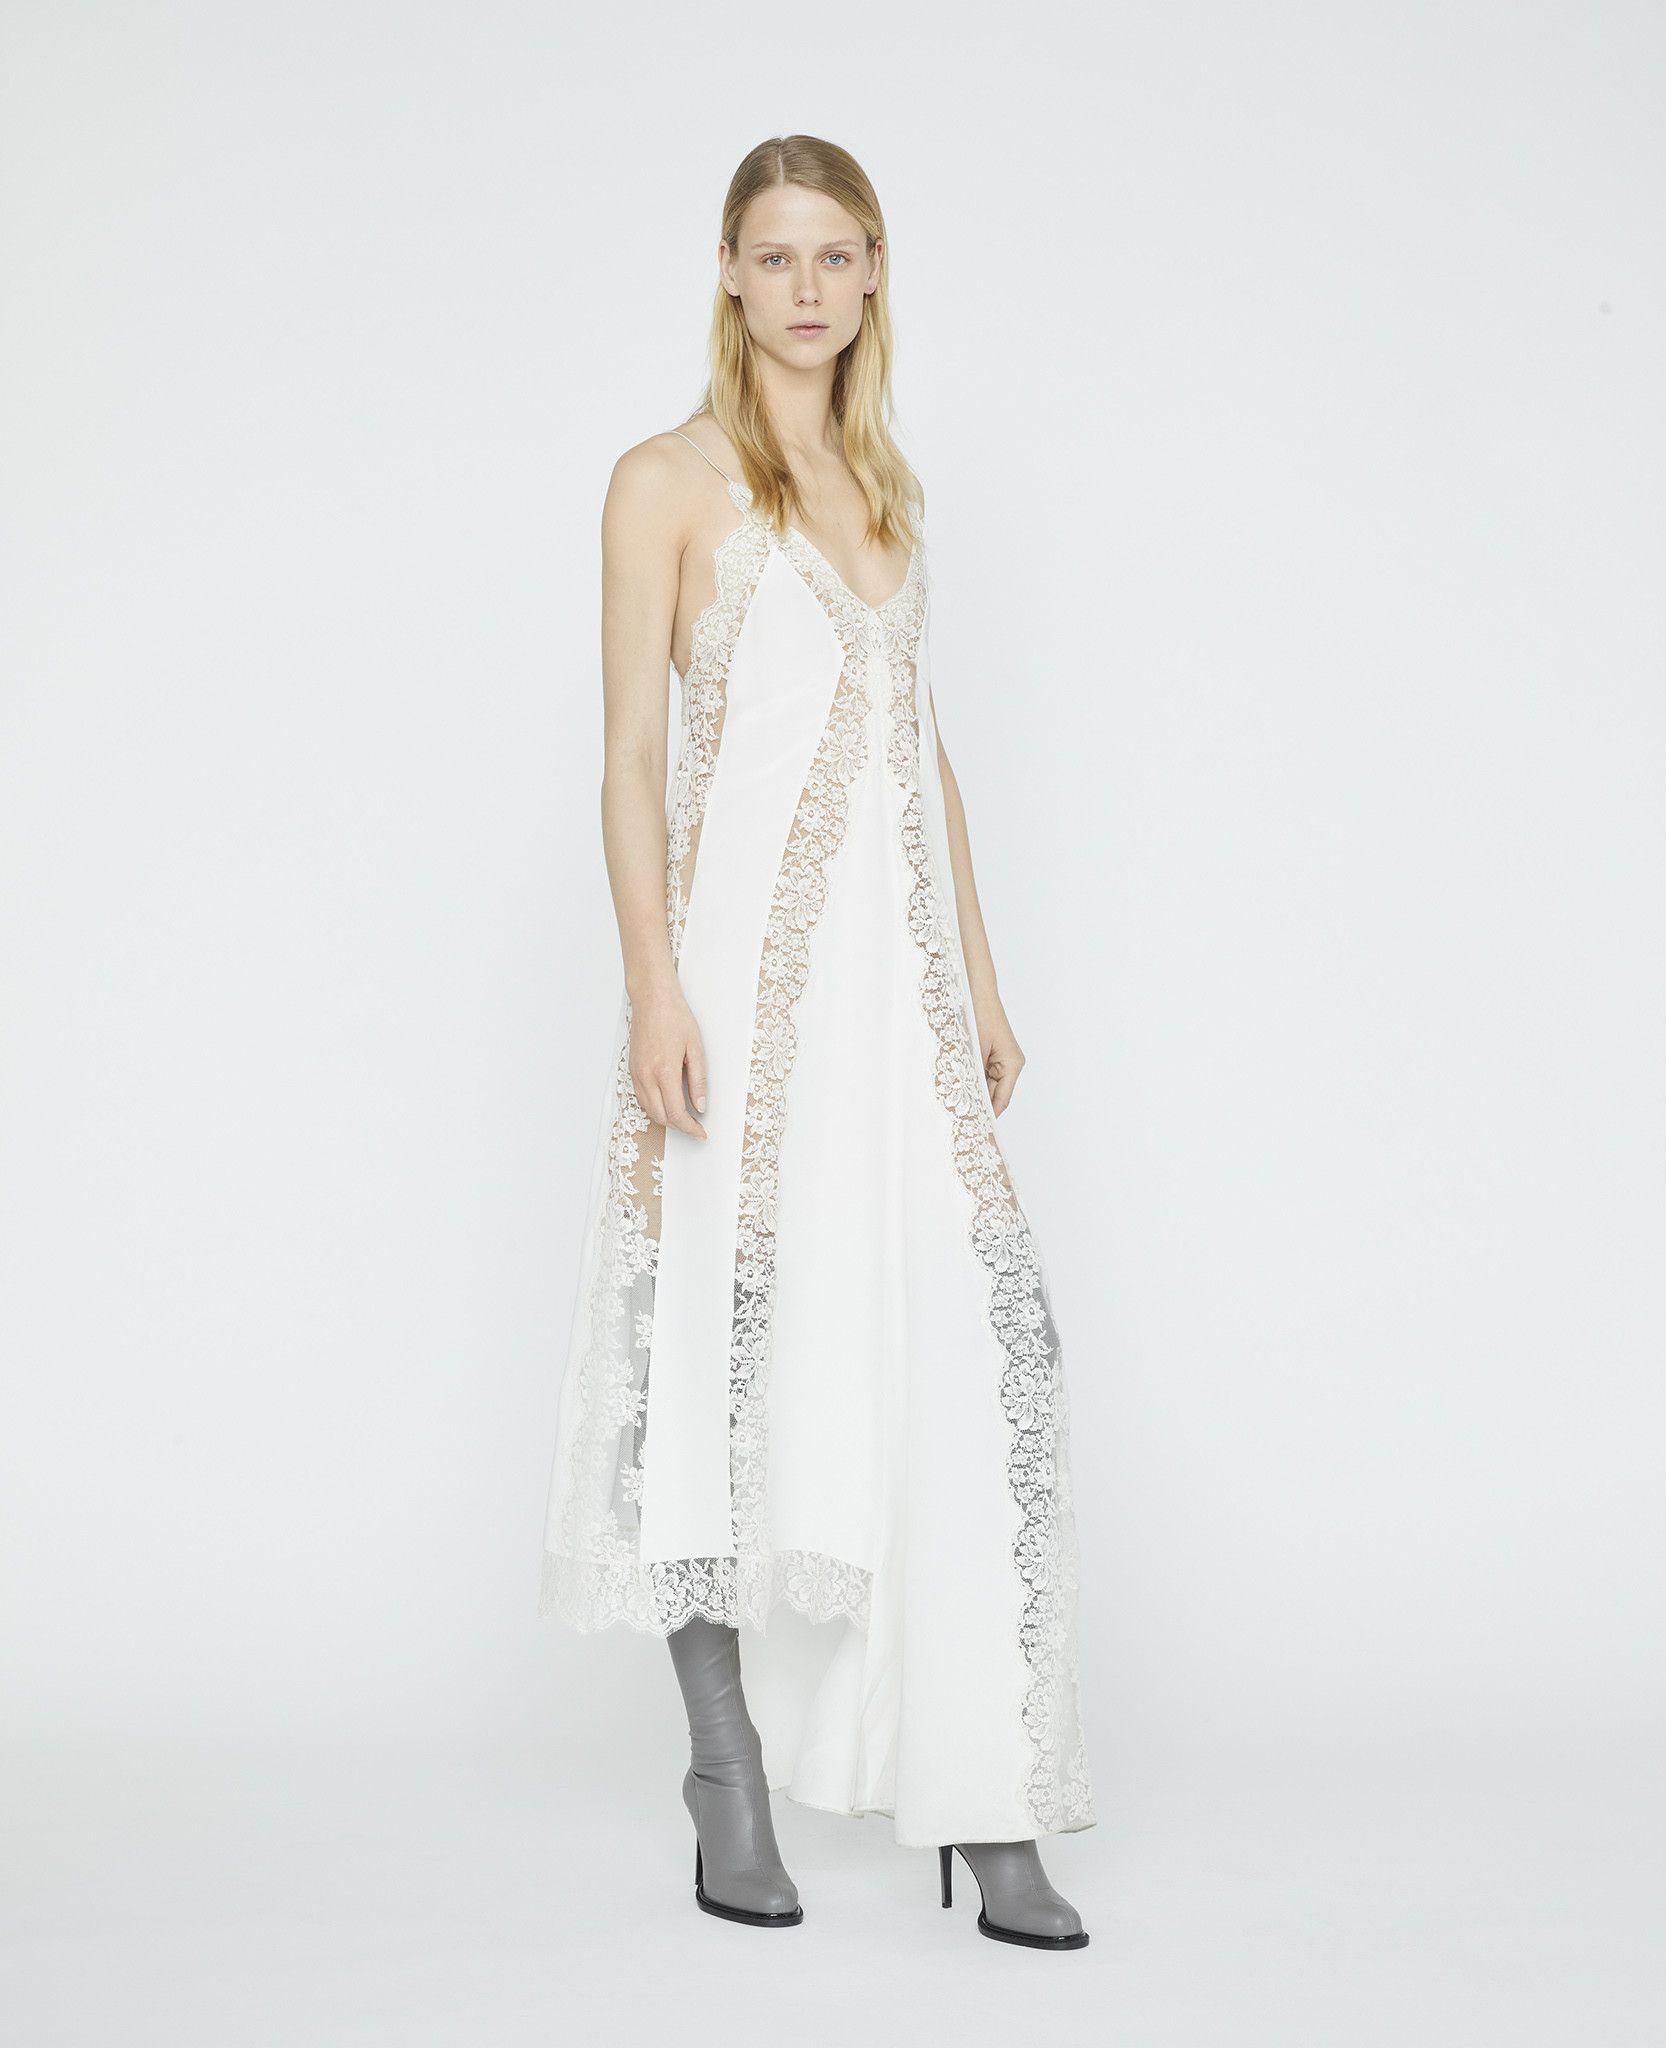 Angie Lace Dress Stella Mccartney Lace Evening Dresses Elegant White Dress Women Dress Collection [ 2048 x 1666 Pixel ]